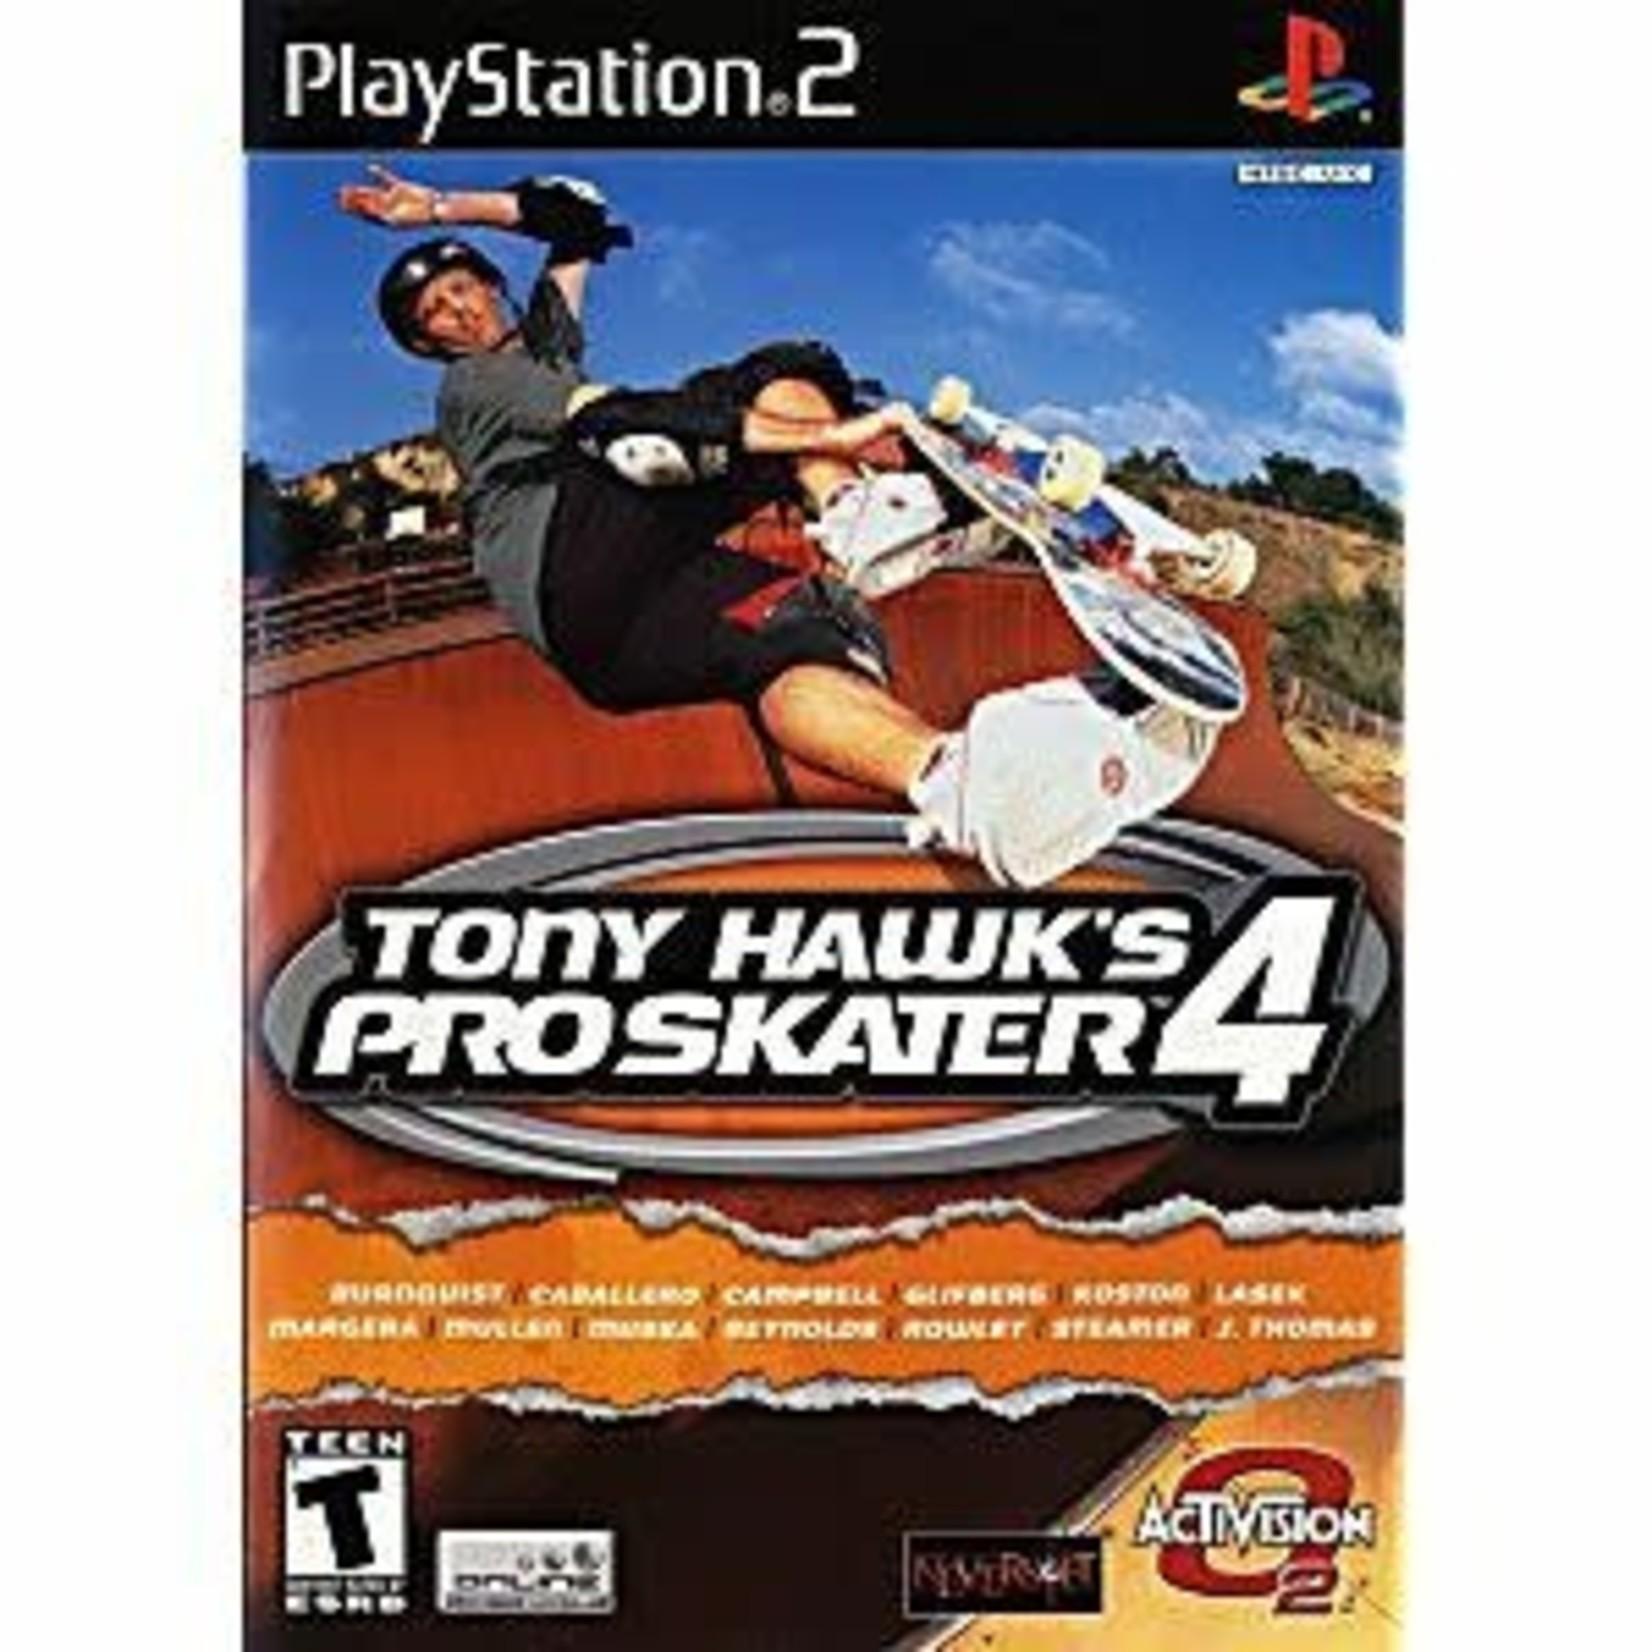 PS2U-TONY HAWK PRO SKATER 4